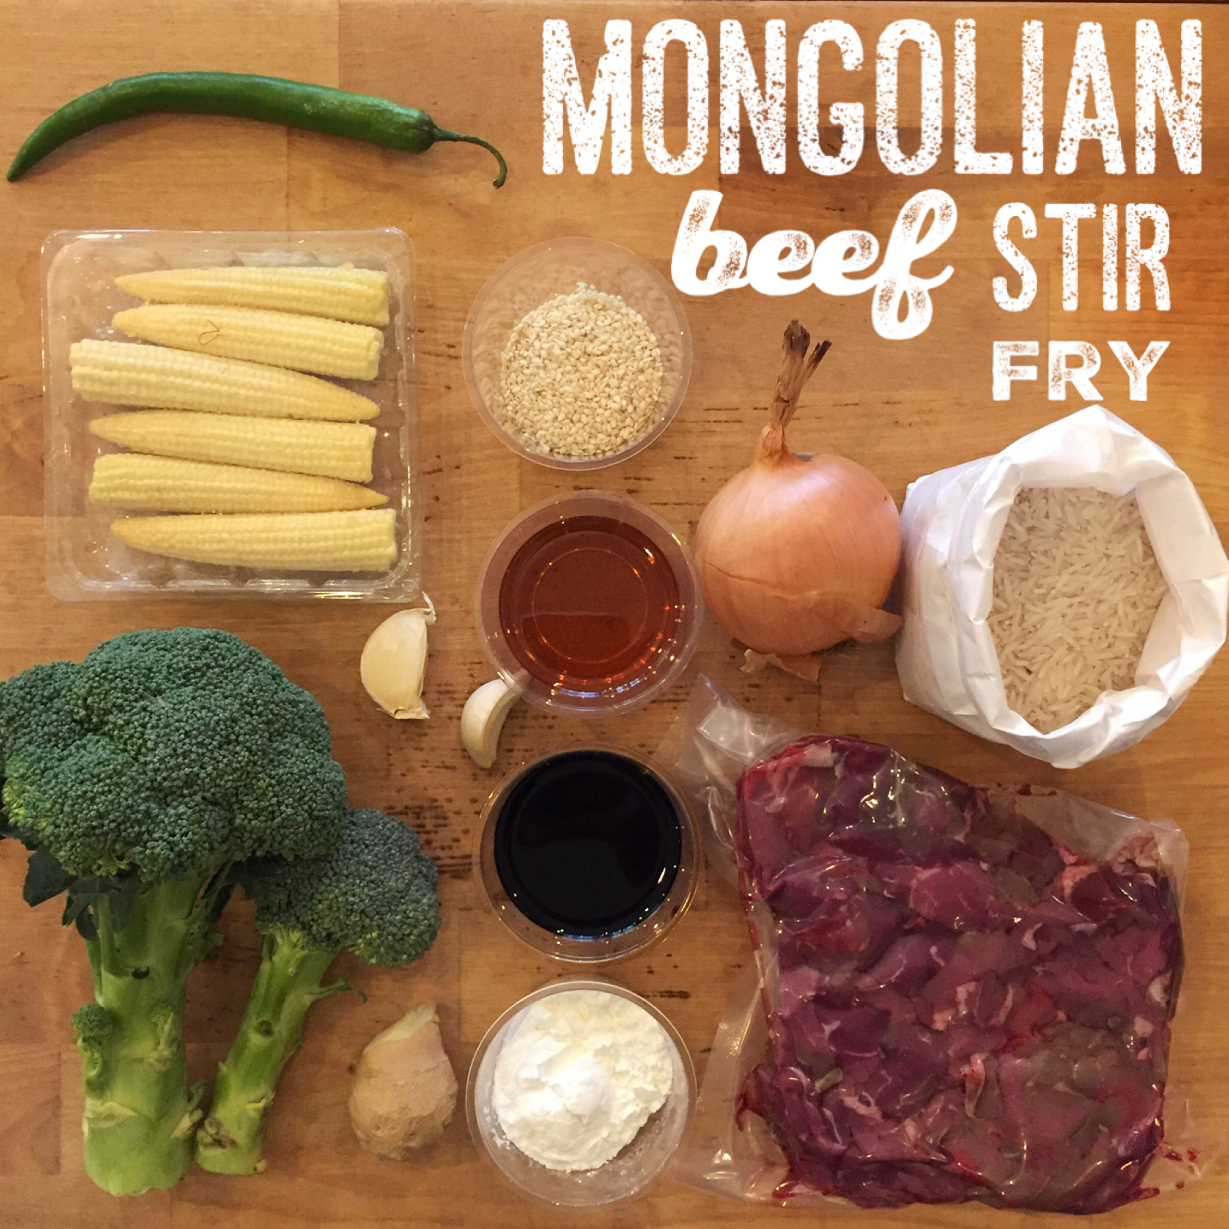 Mongolian Beef Stir Fry Meal Bag